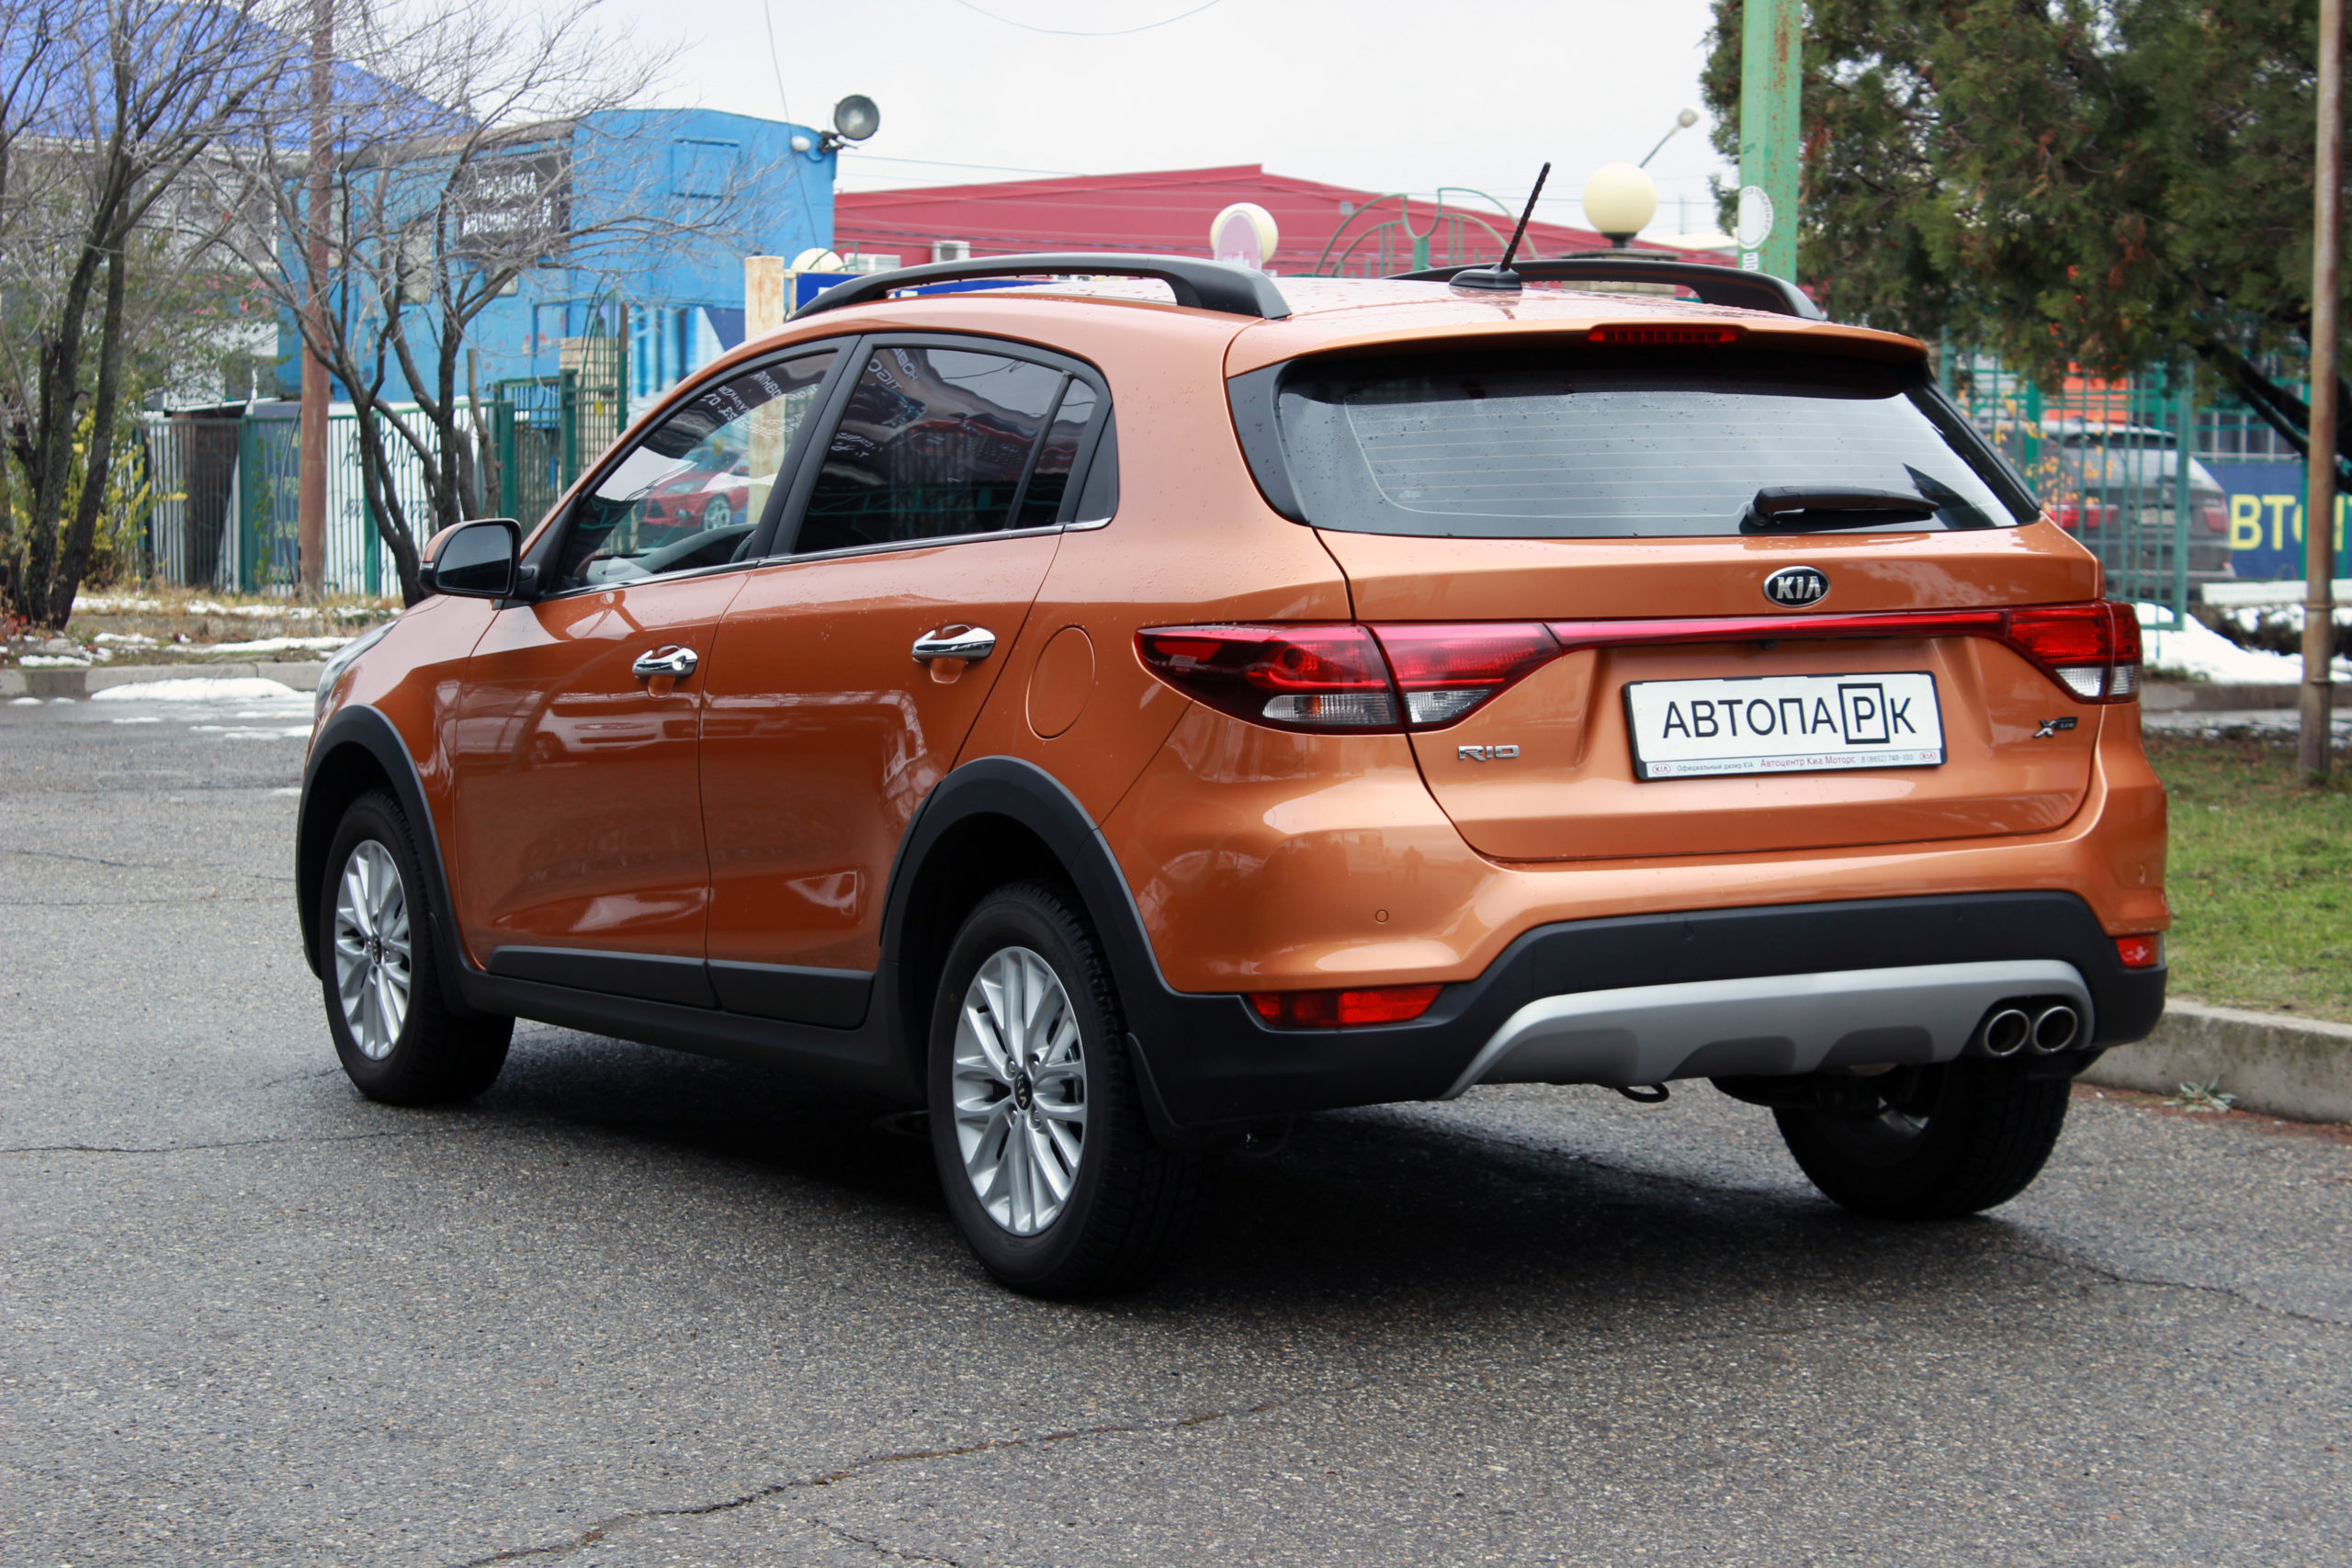 Купить KIA Rio X-Line (Оранжевый) - Автопарк Ставрополь